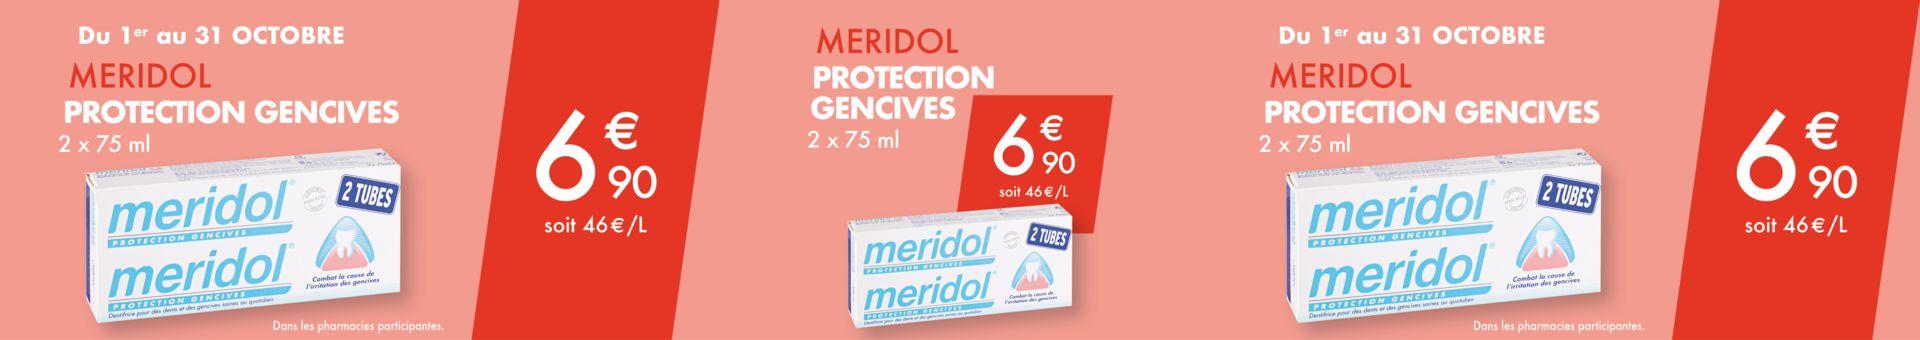 Pharmacie Bleone Sud,DIGNE LES BAINS